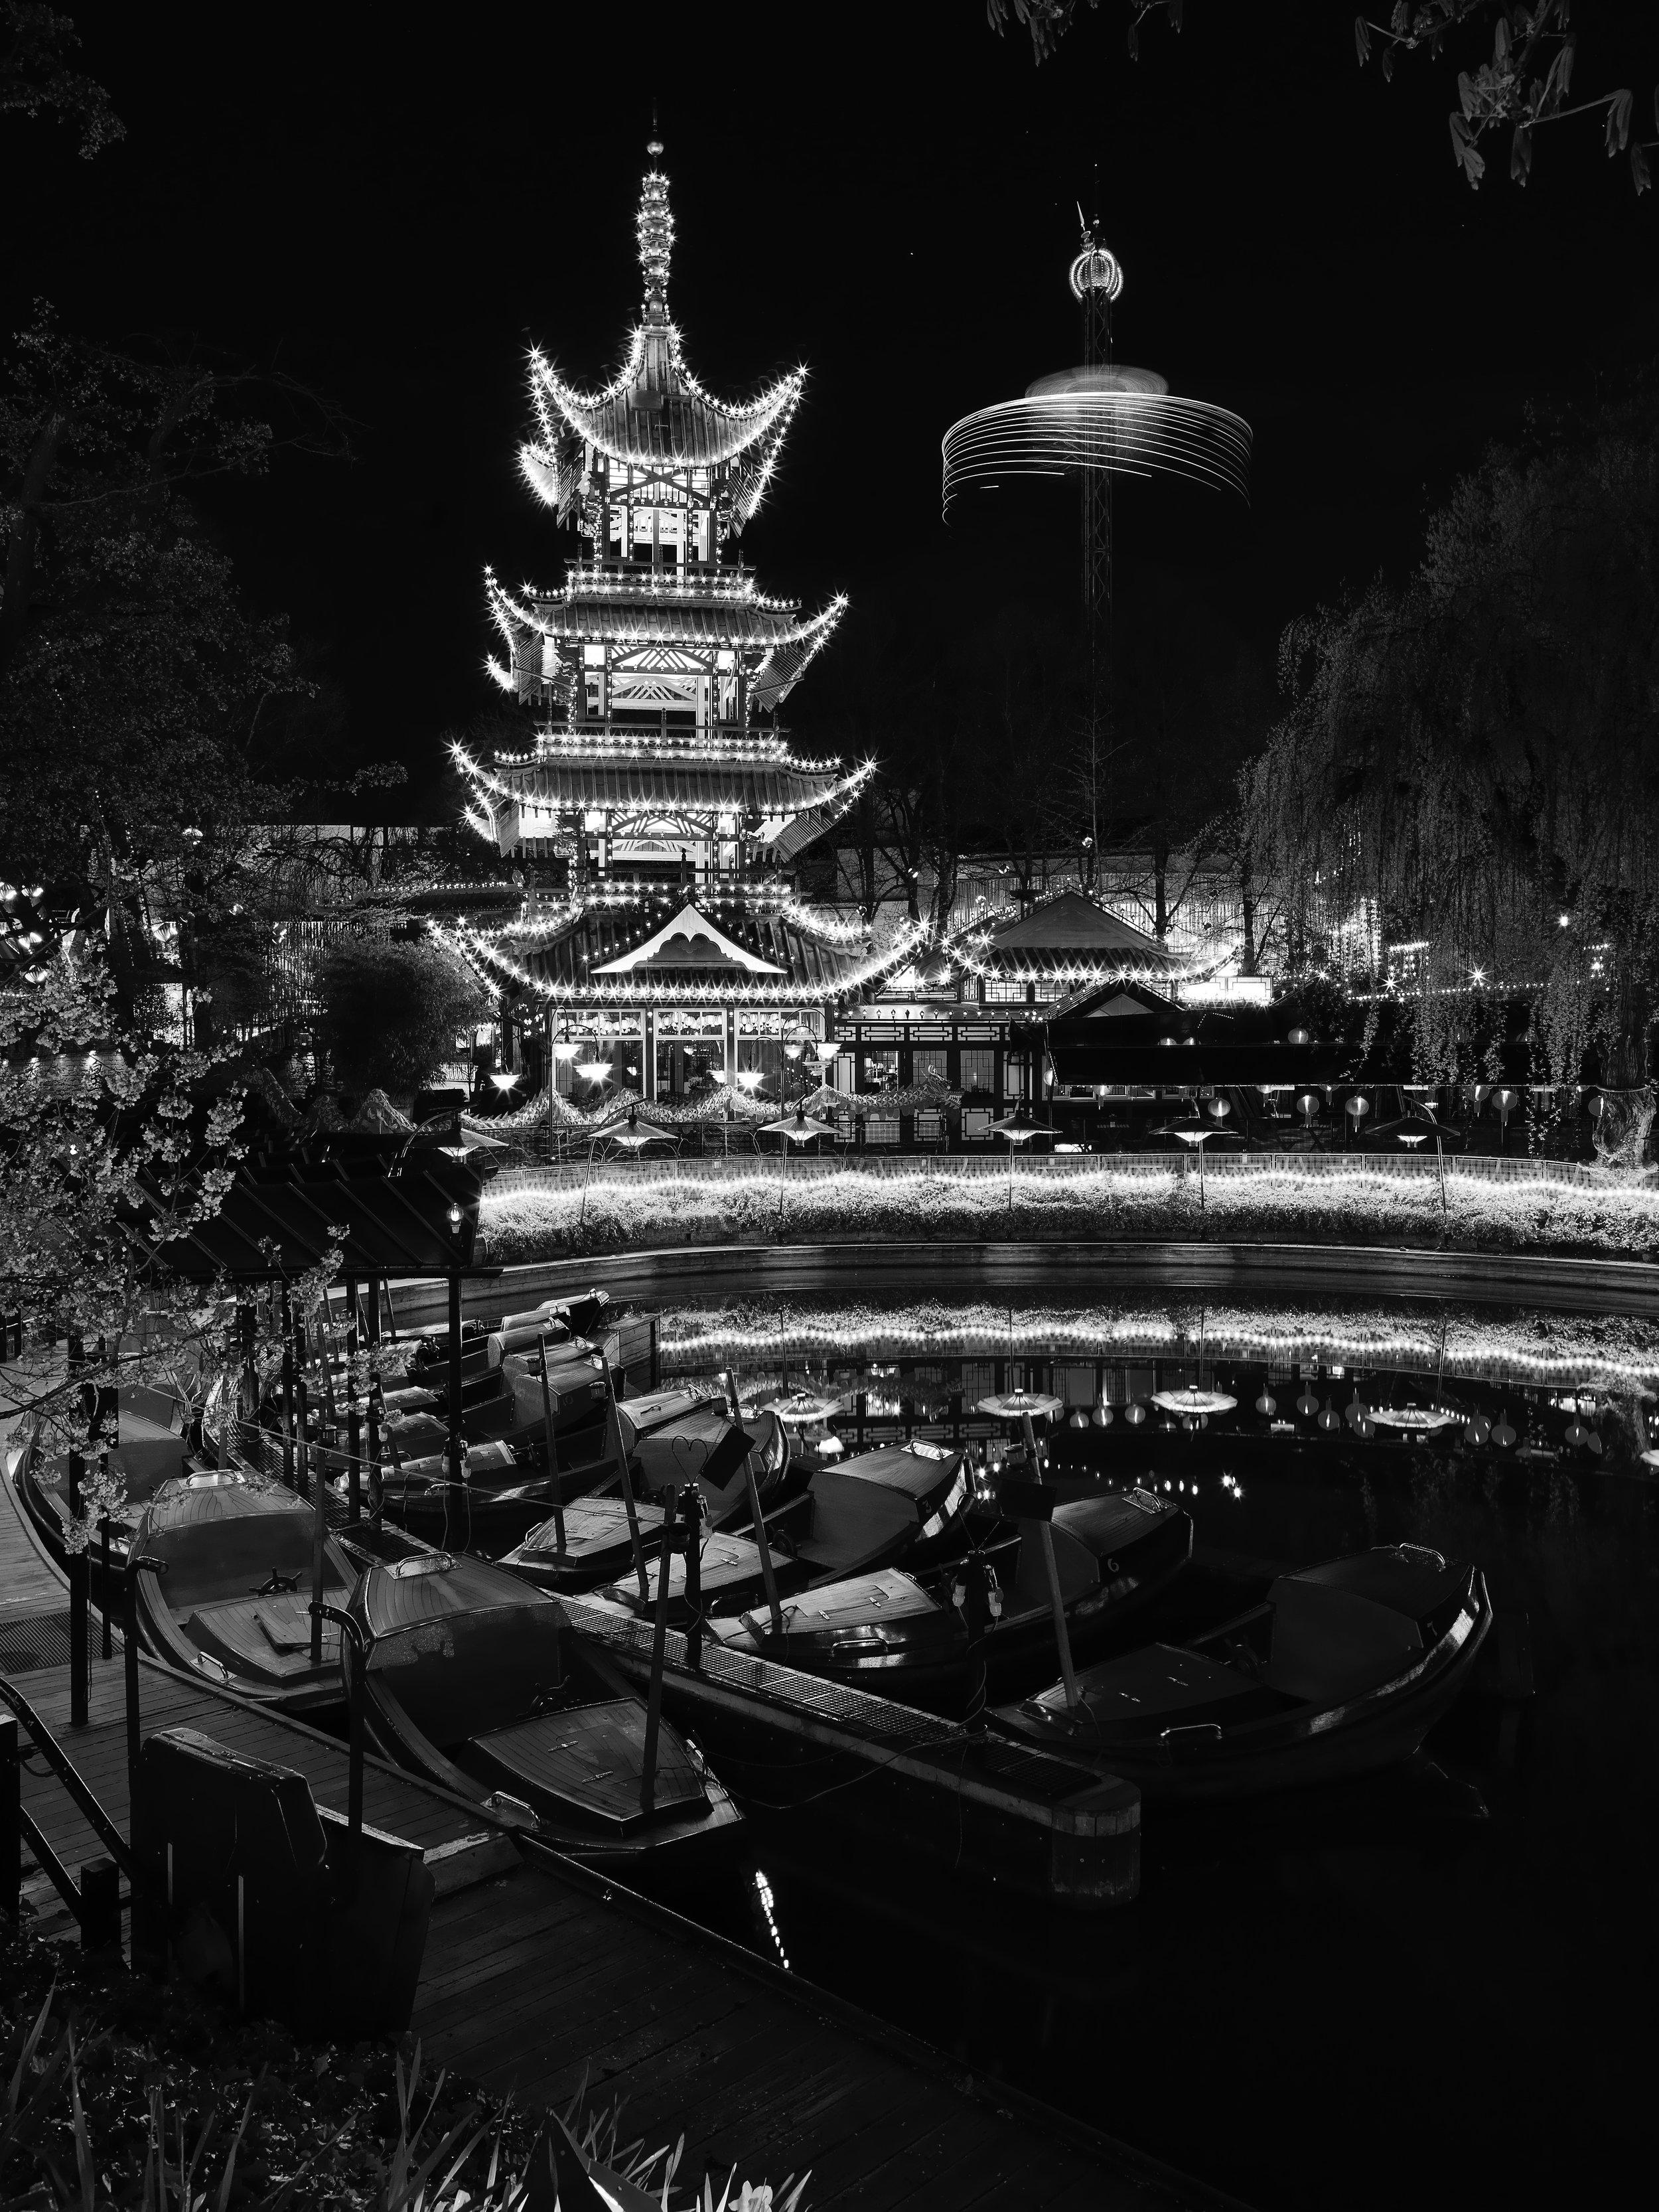 1719H Tivoli by Night 0025 copy_0000.jpg